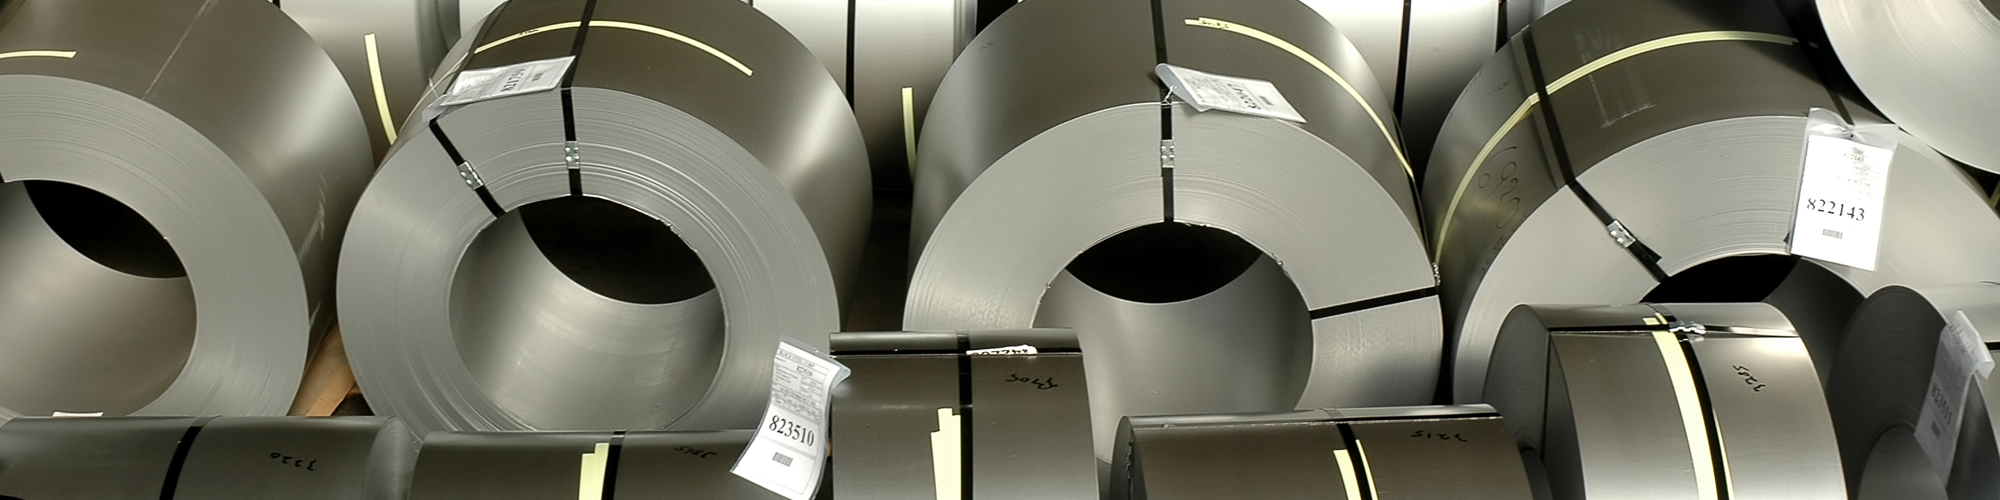 Aluminizing of steel